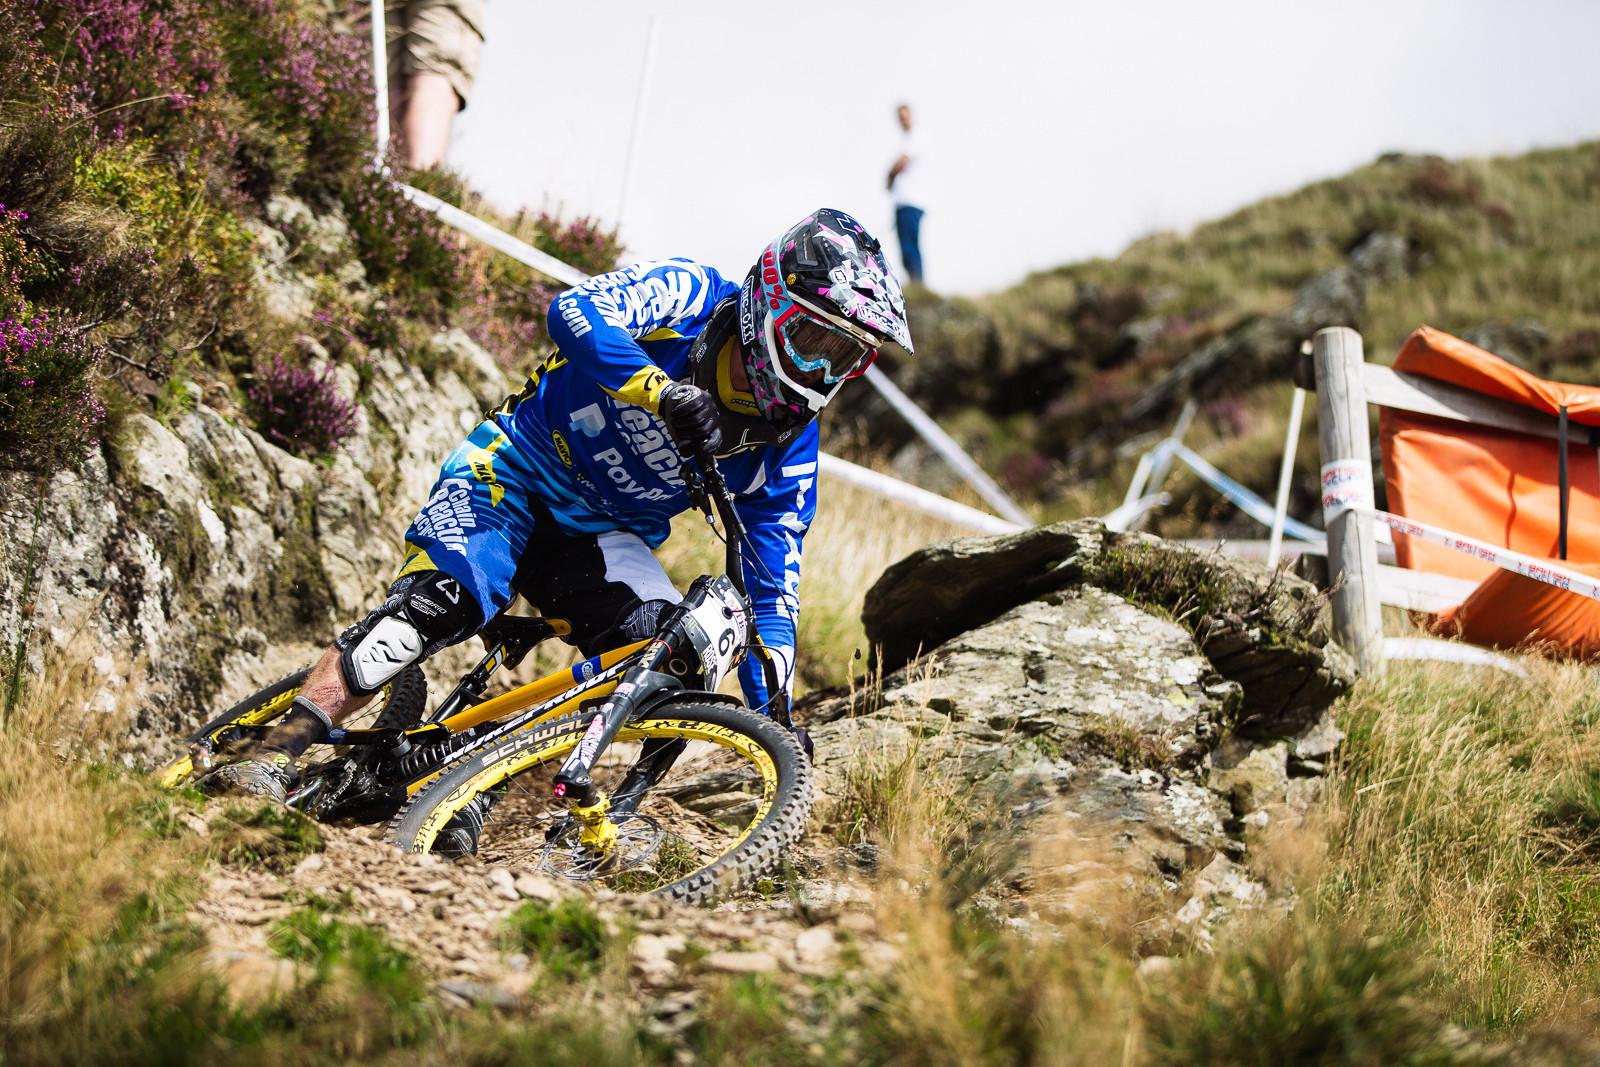 Joe Smith, 2015 British Downhill Series Finals, Antur Stiniog - 2015 British Downhill Series Finals - Mountain Biking Pictures - Vital MTB